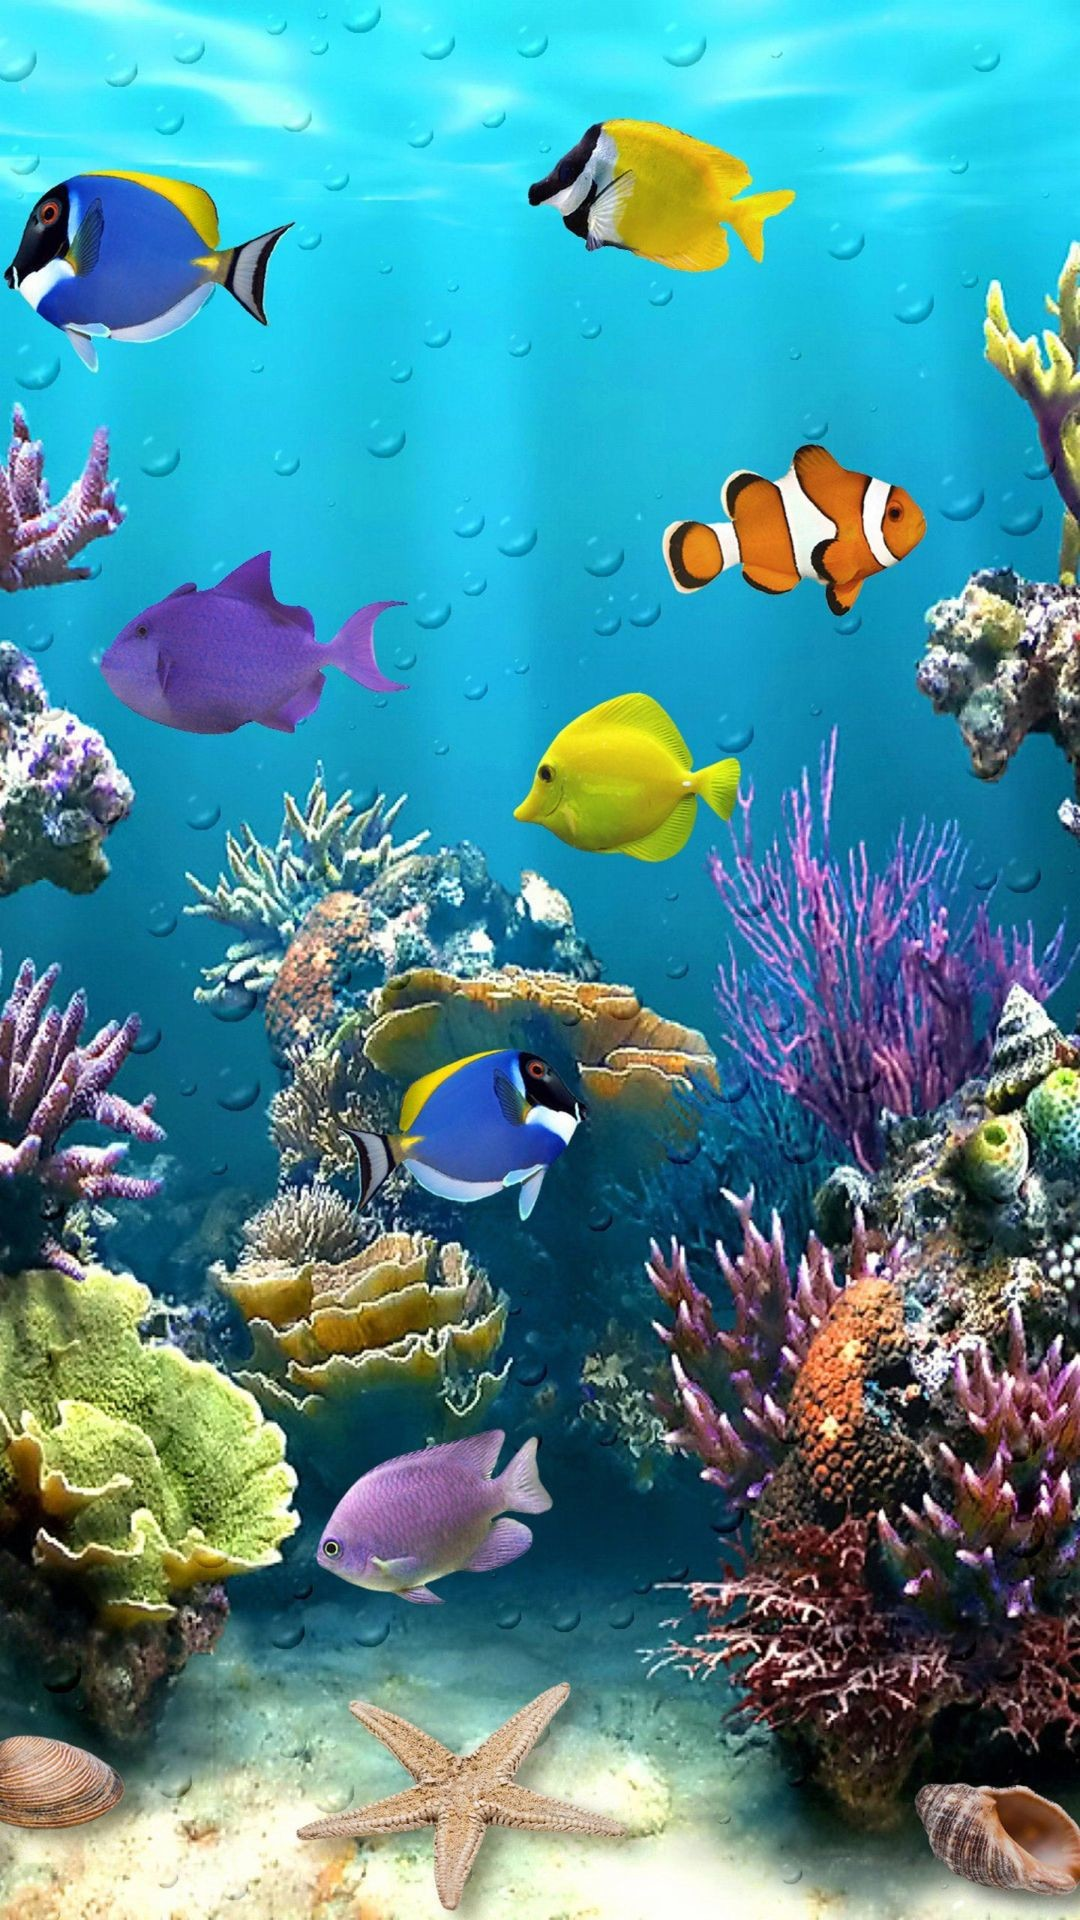 Fish Live Wallpaper, Picture, Image